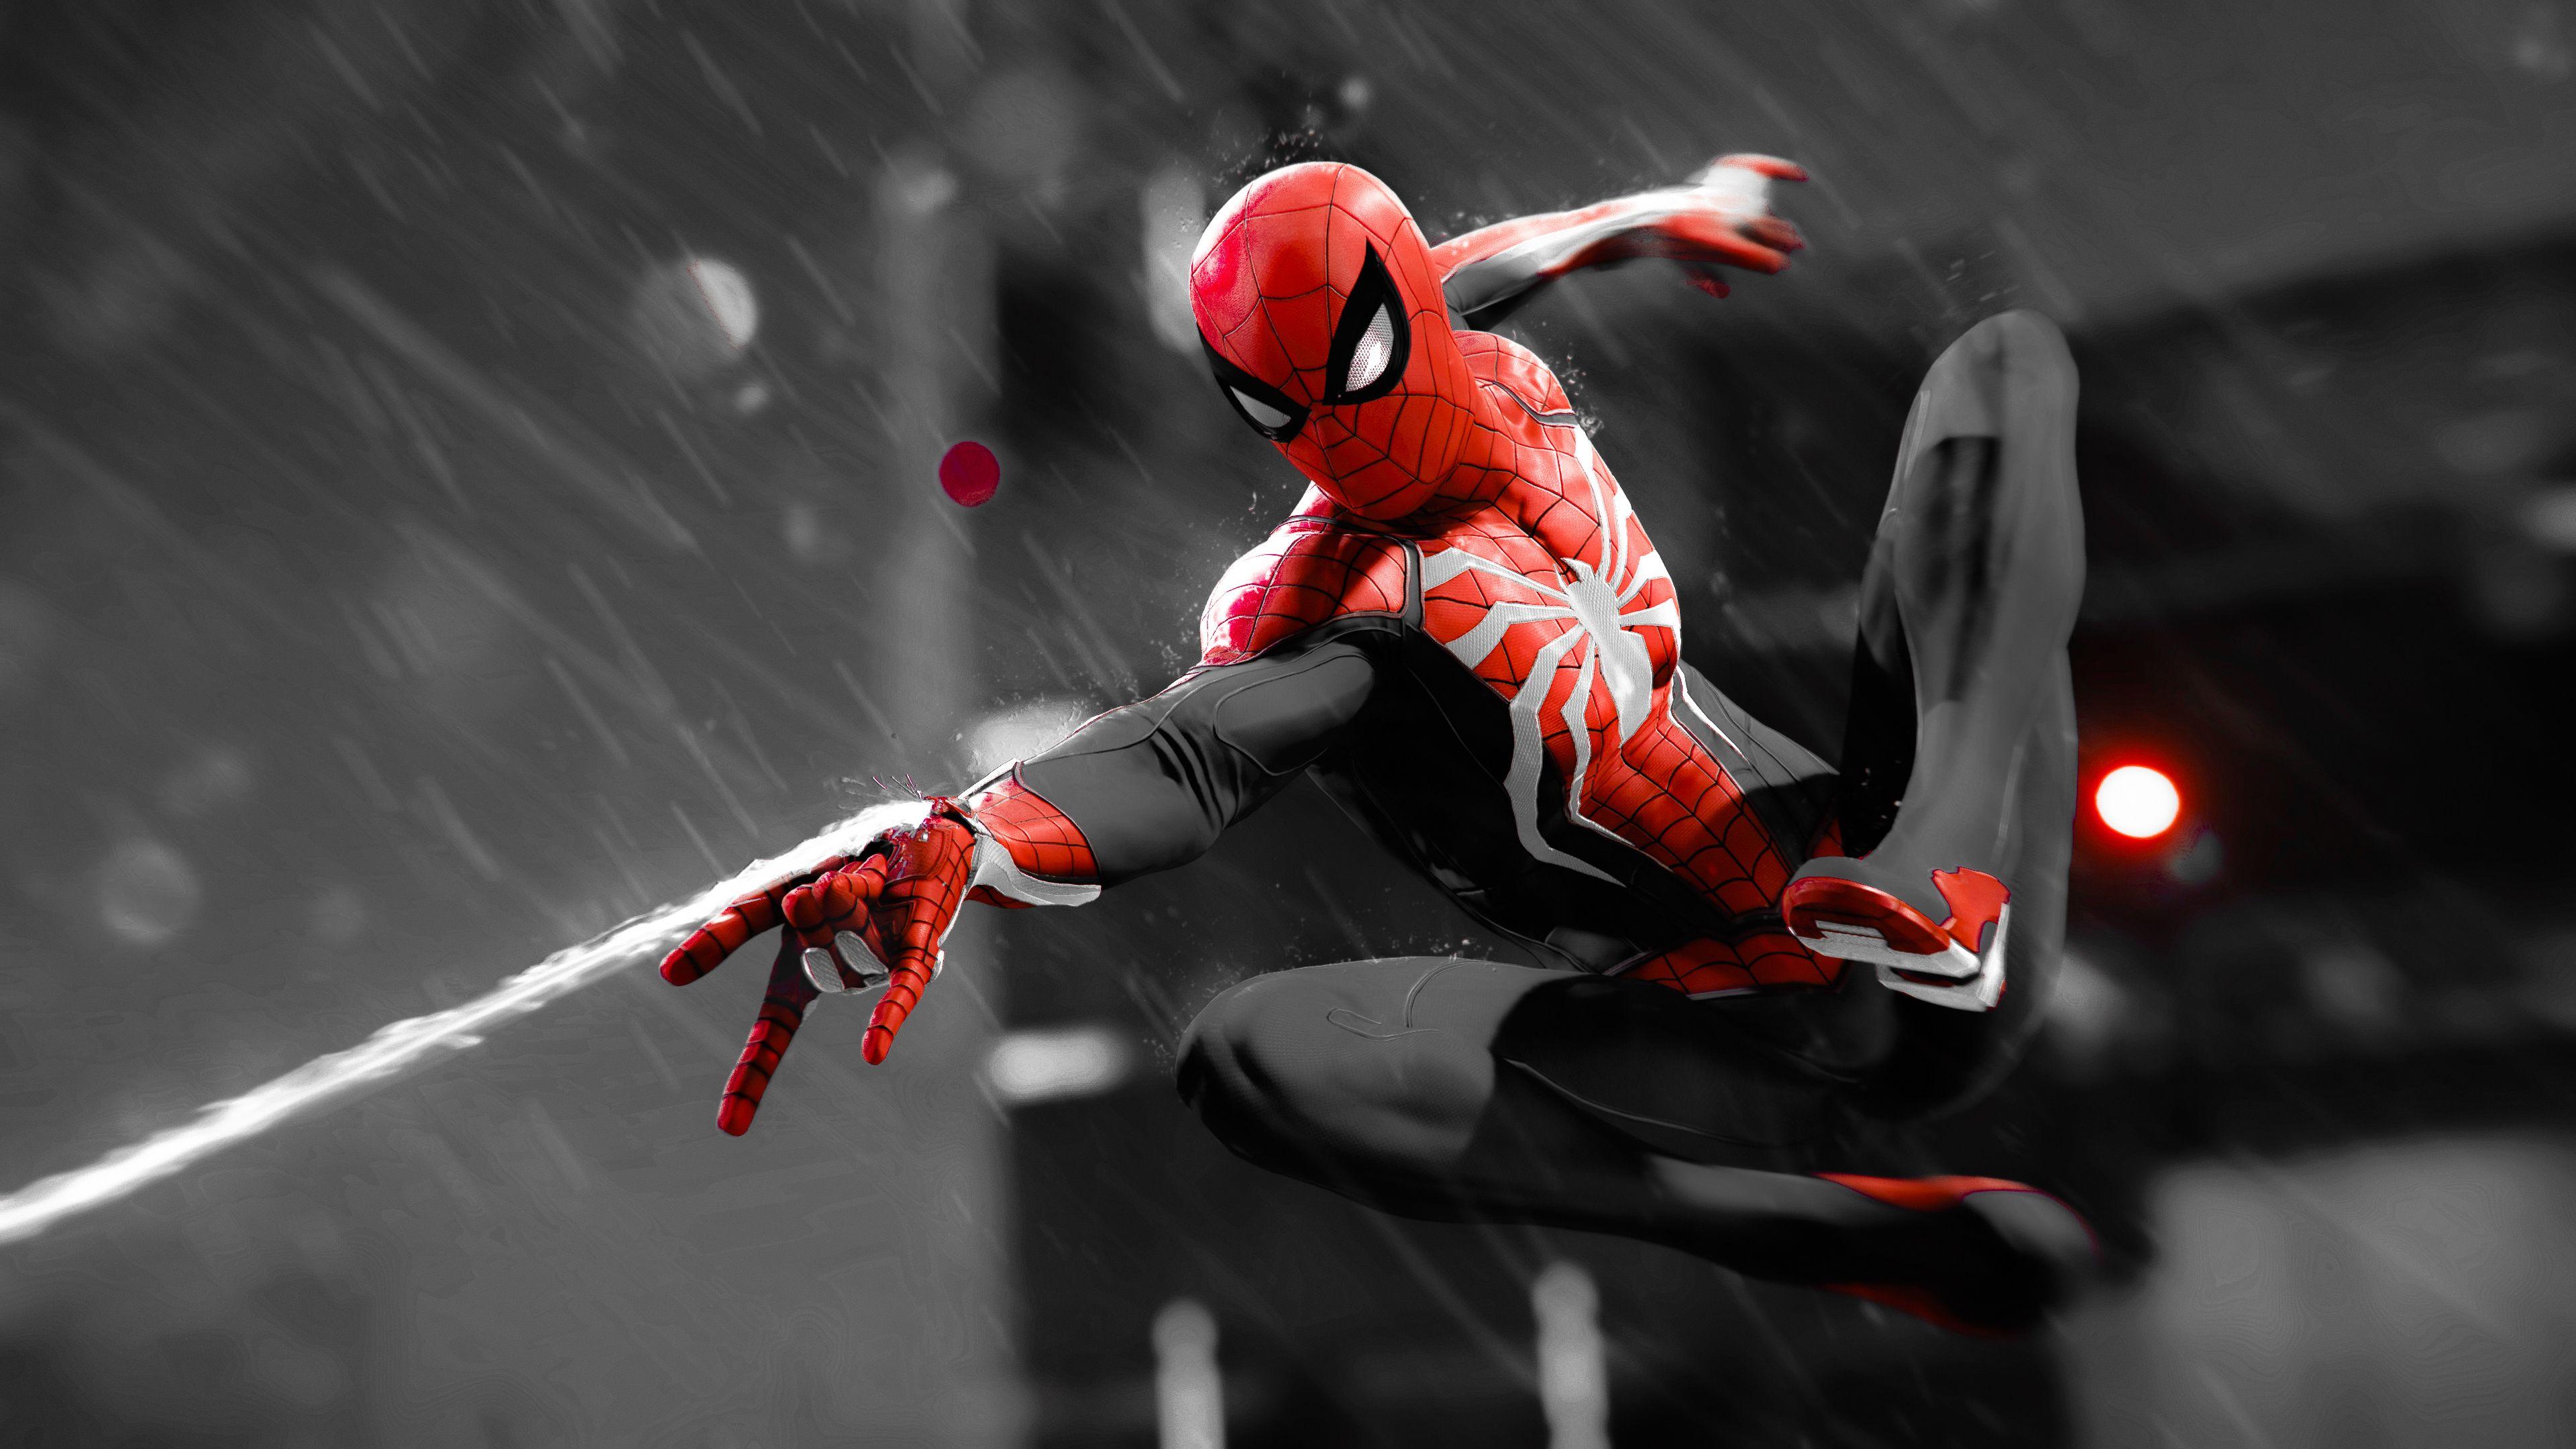 Spiderman Monochrome 4K superheroes wallpapers, spiderman